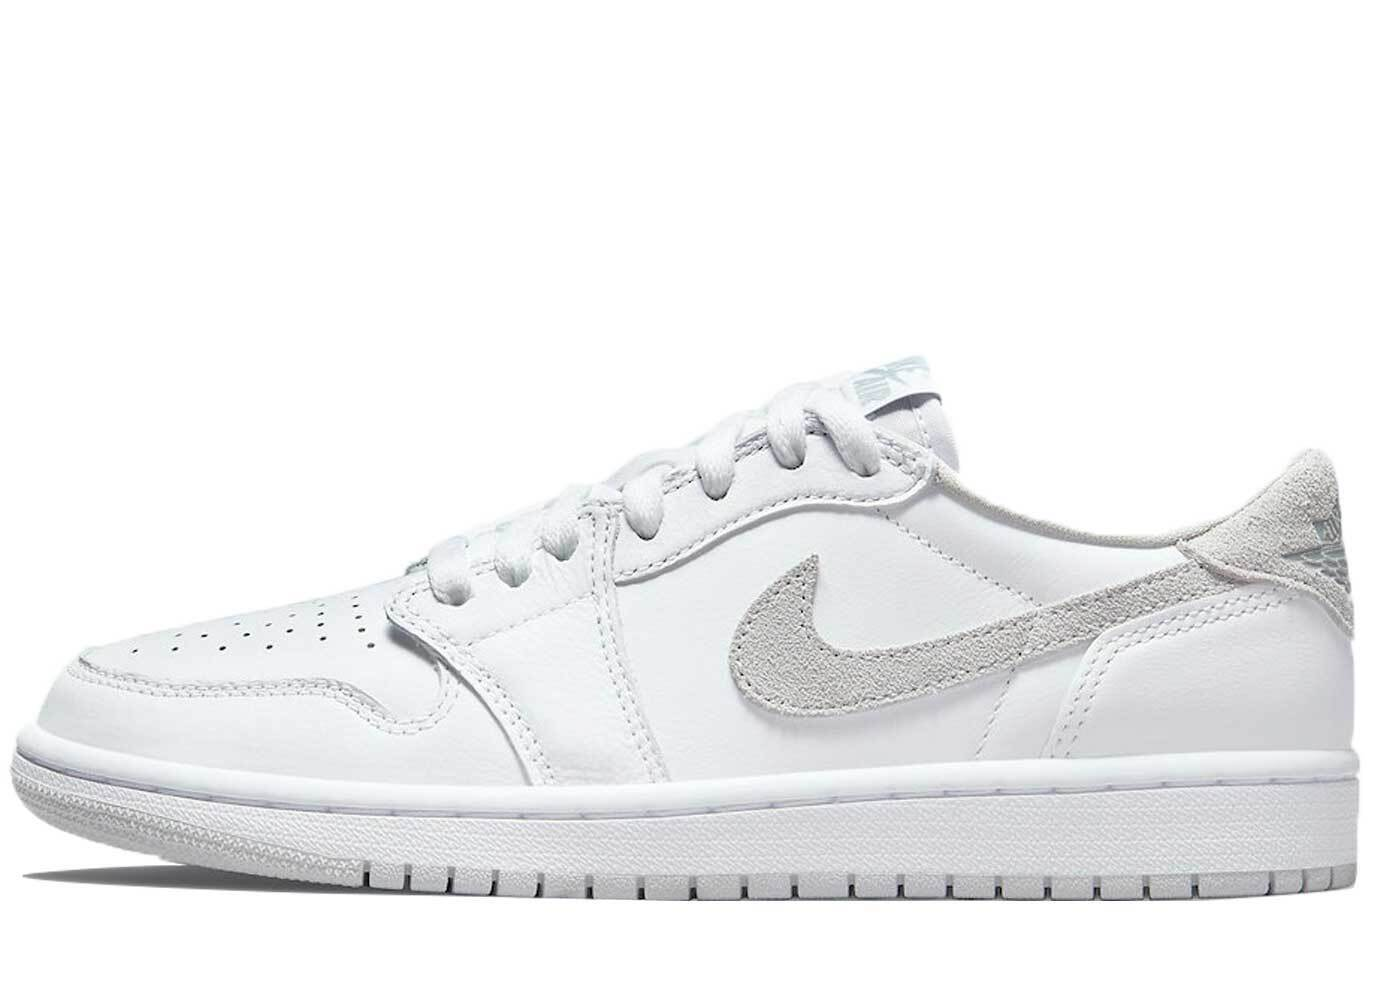 Nike Air Jordan 1 Low OG Neutral Greyの写真